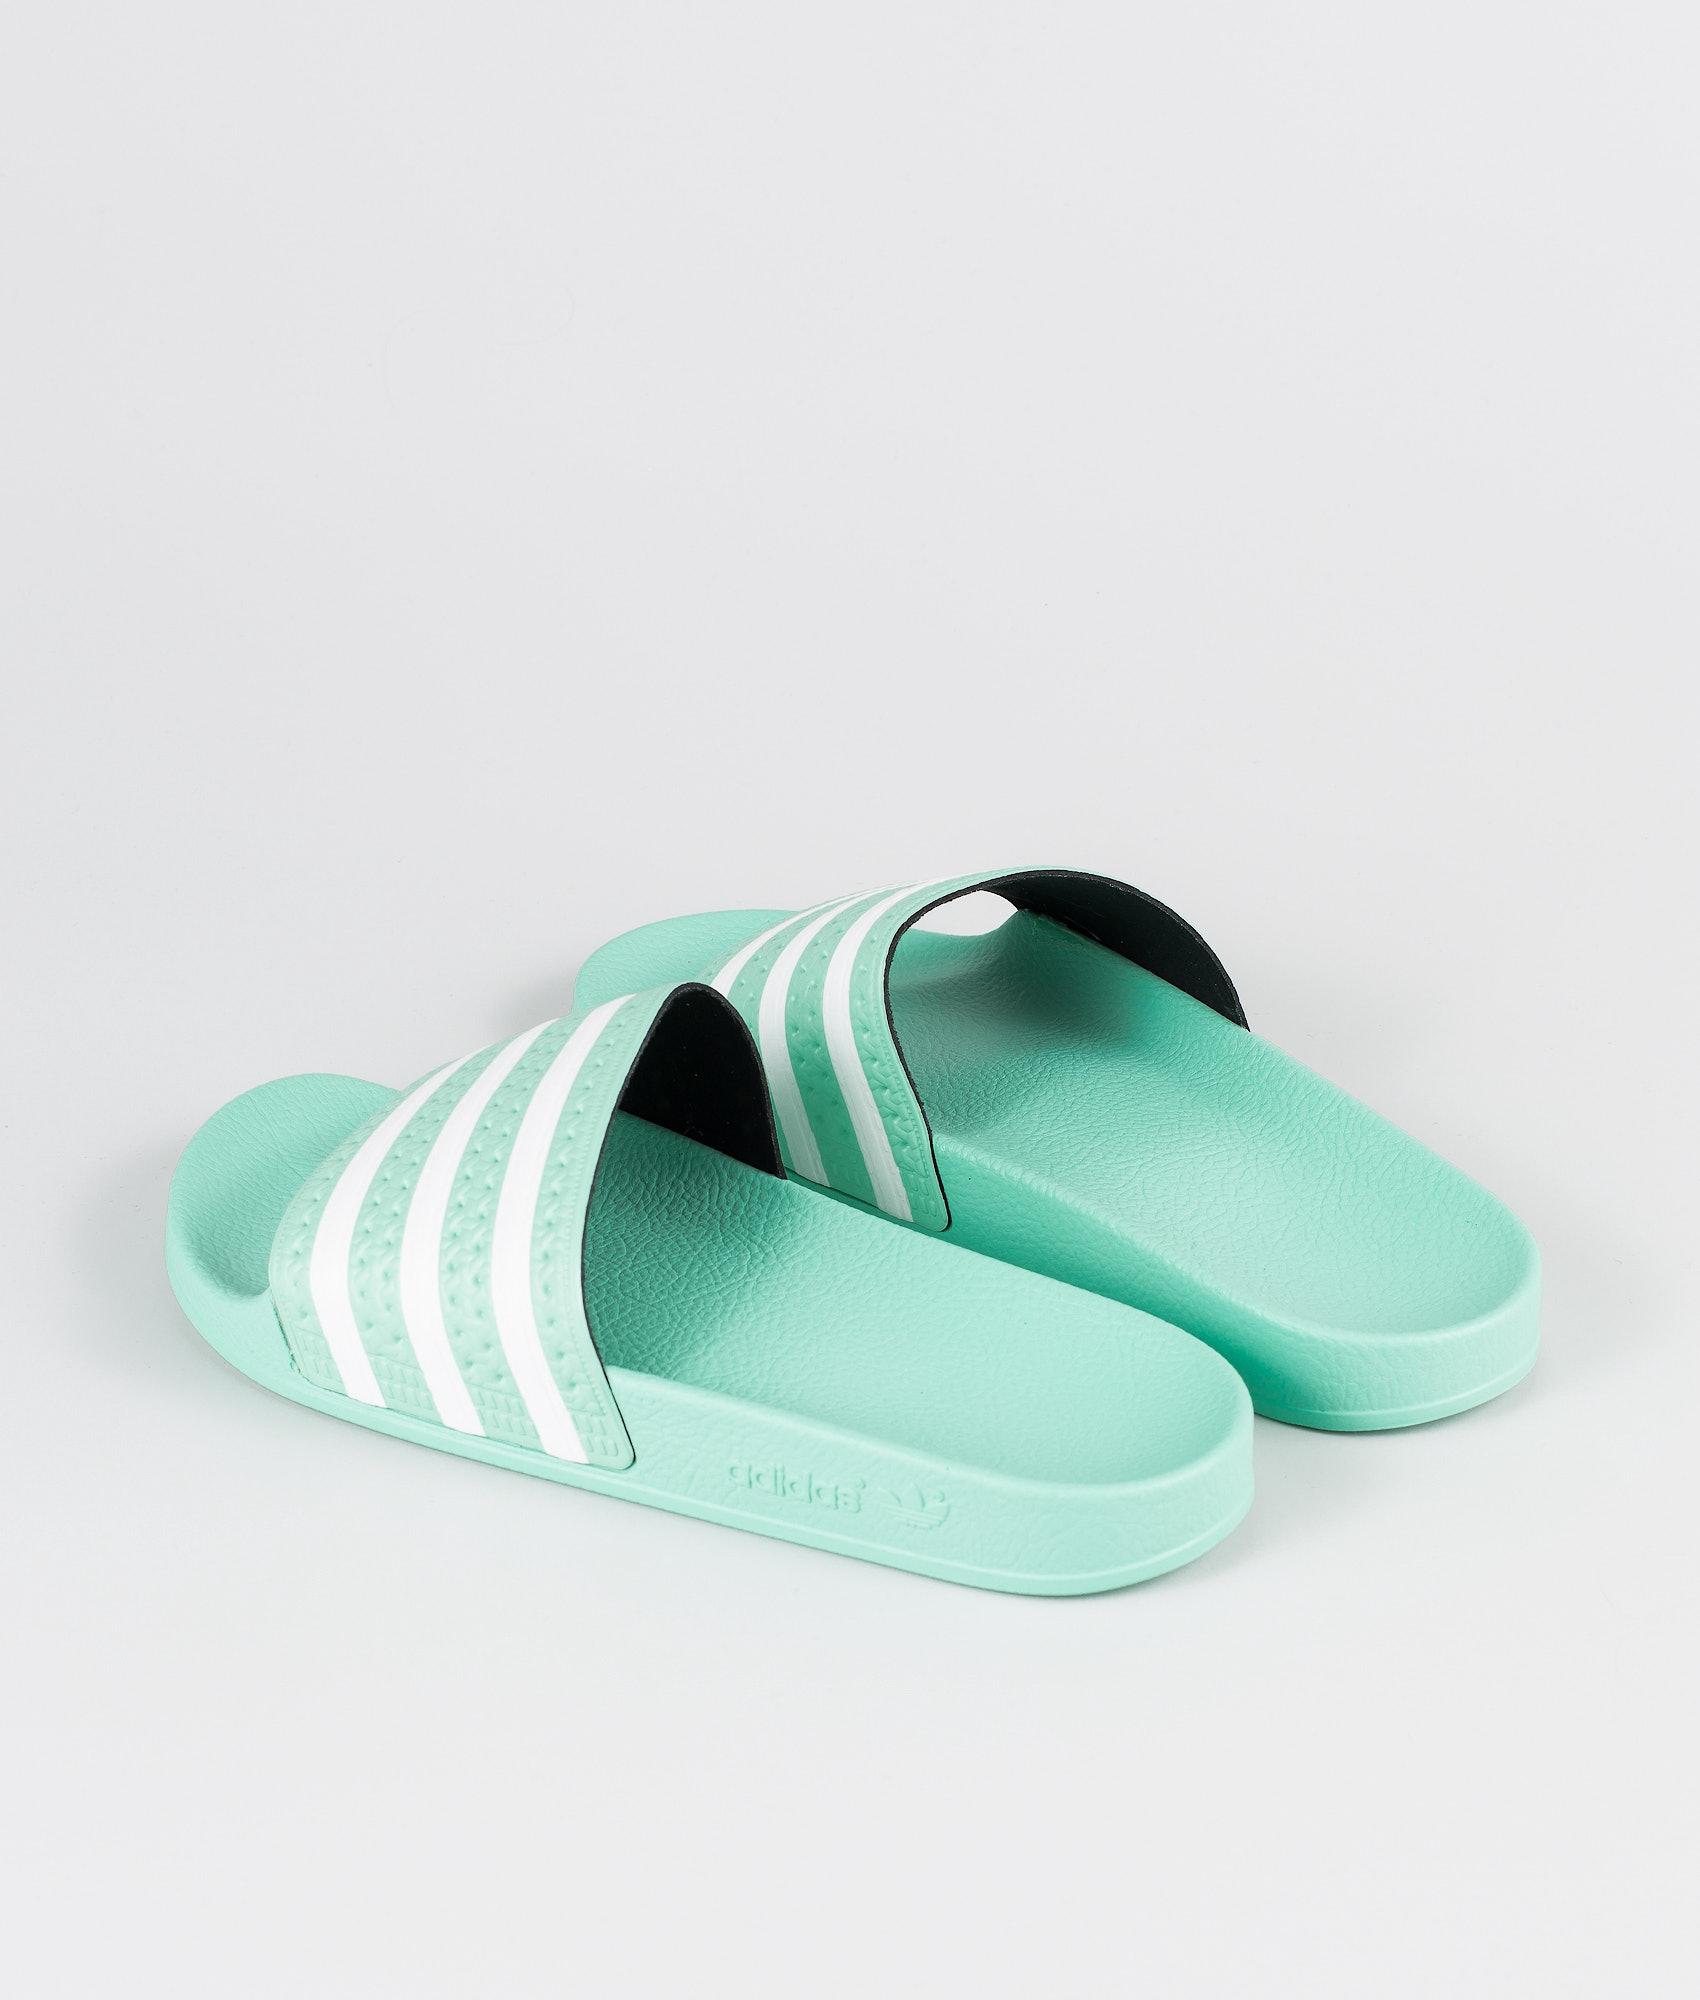 dbf0e763cd75 Adidas Originals Adilette Sandal Clear Mint Clear Mint Ftwr White ...